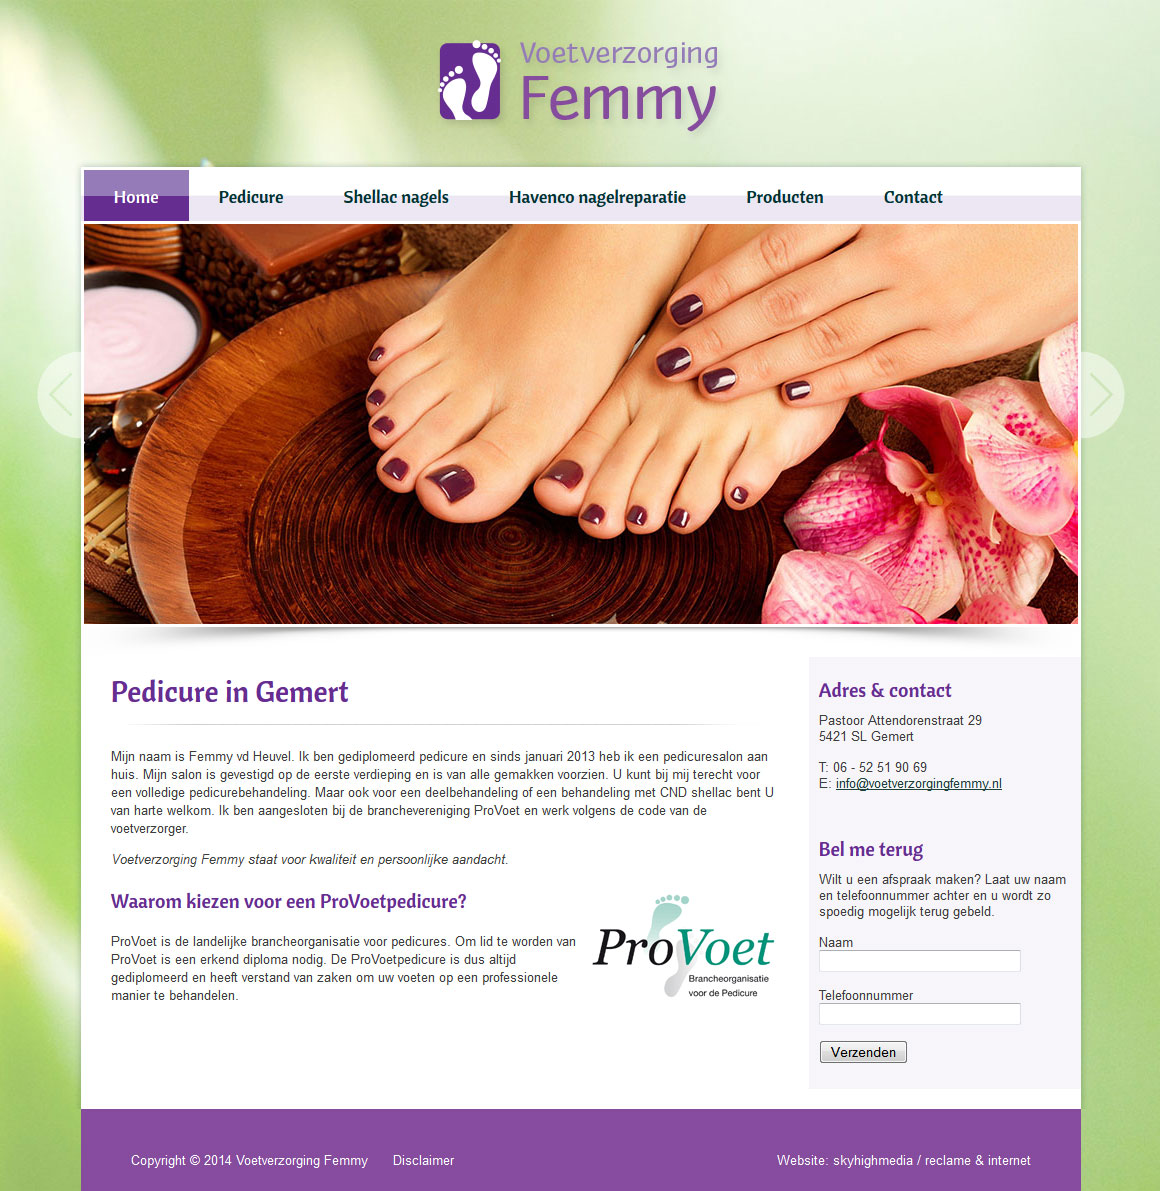 voetverzorging-femmy-website-1